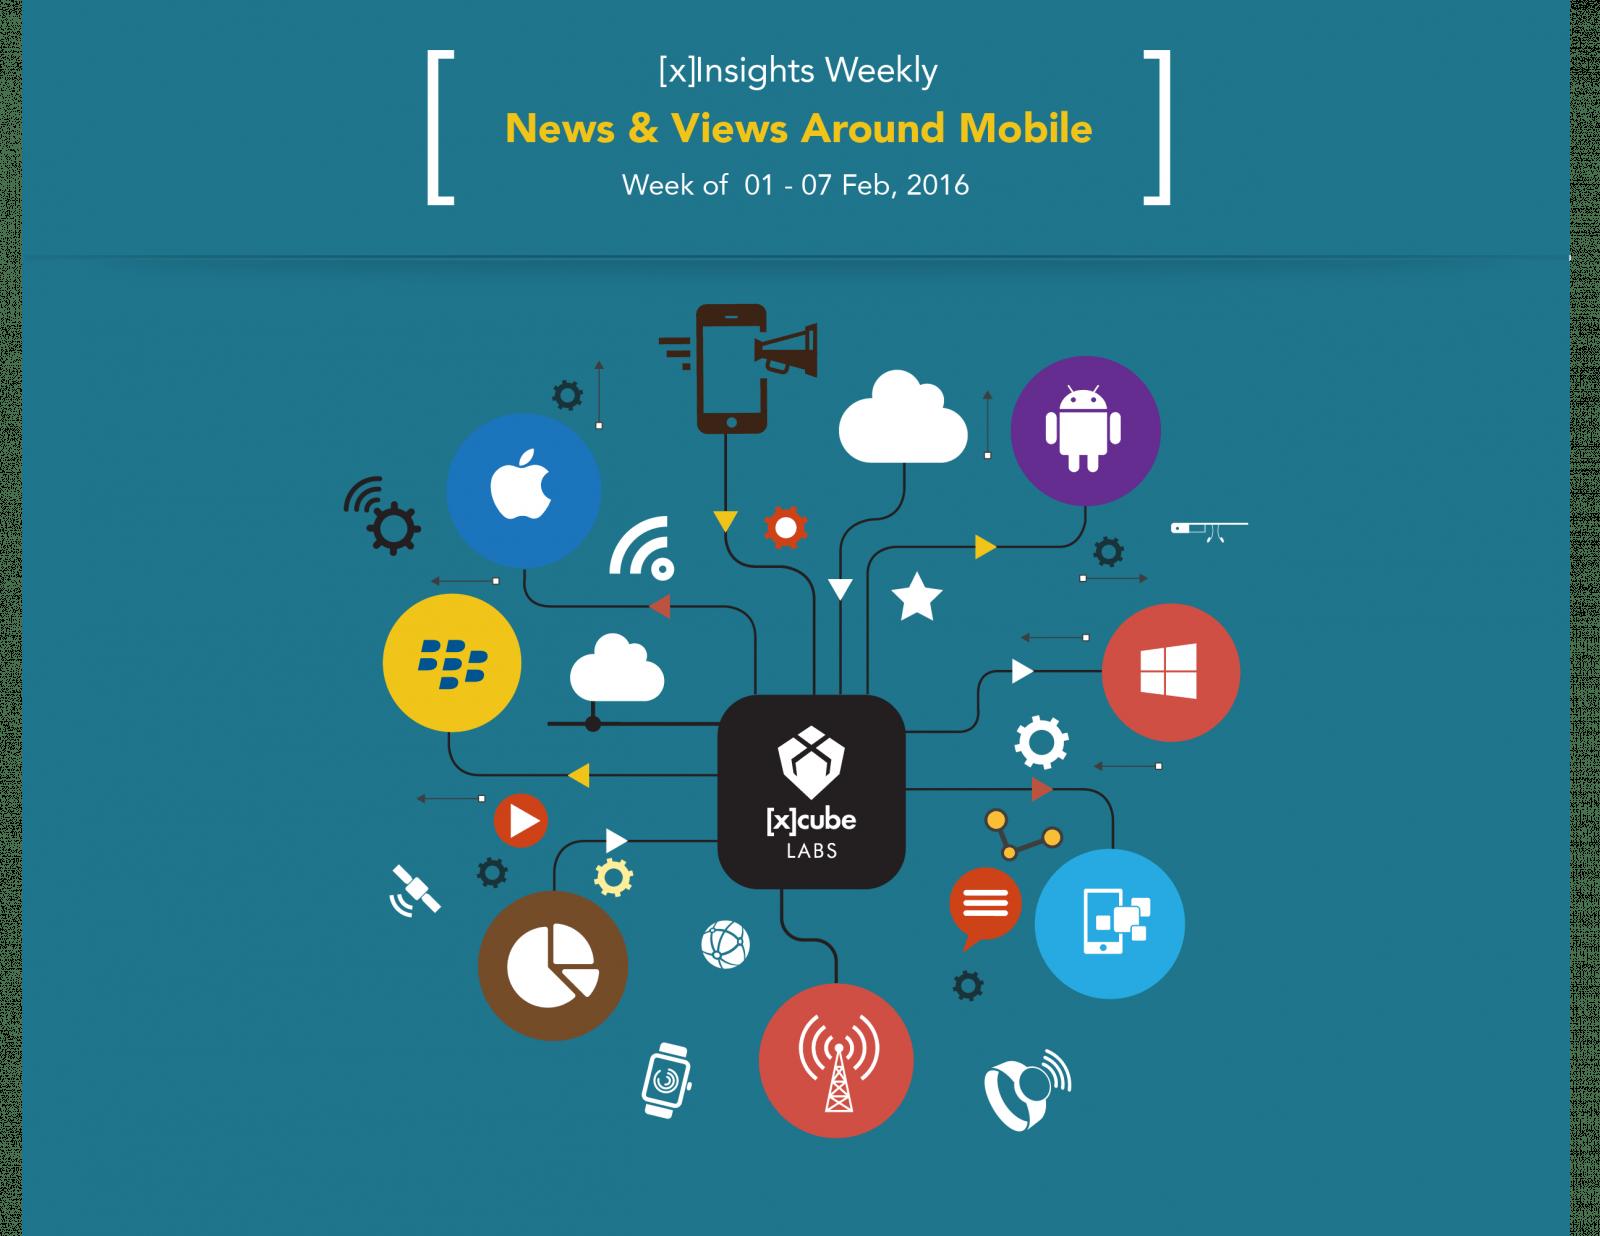 enterprise-mobile-news